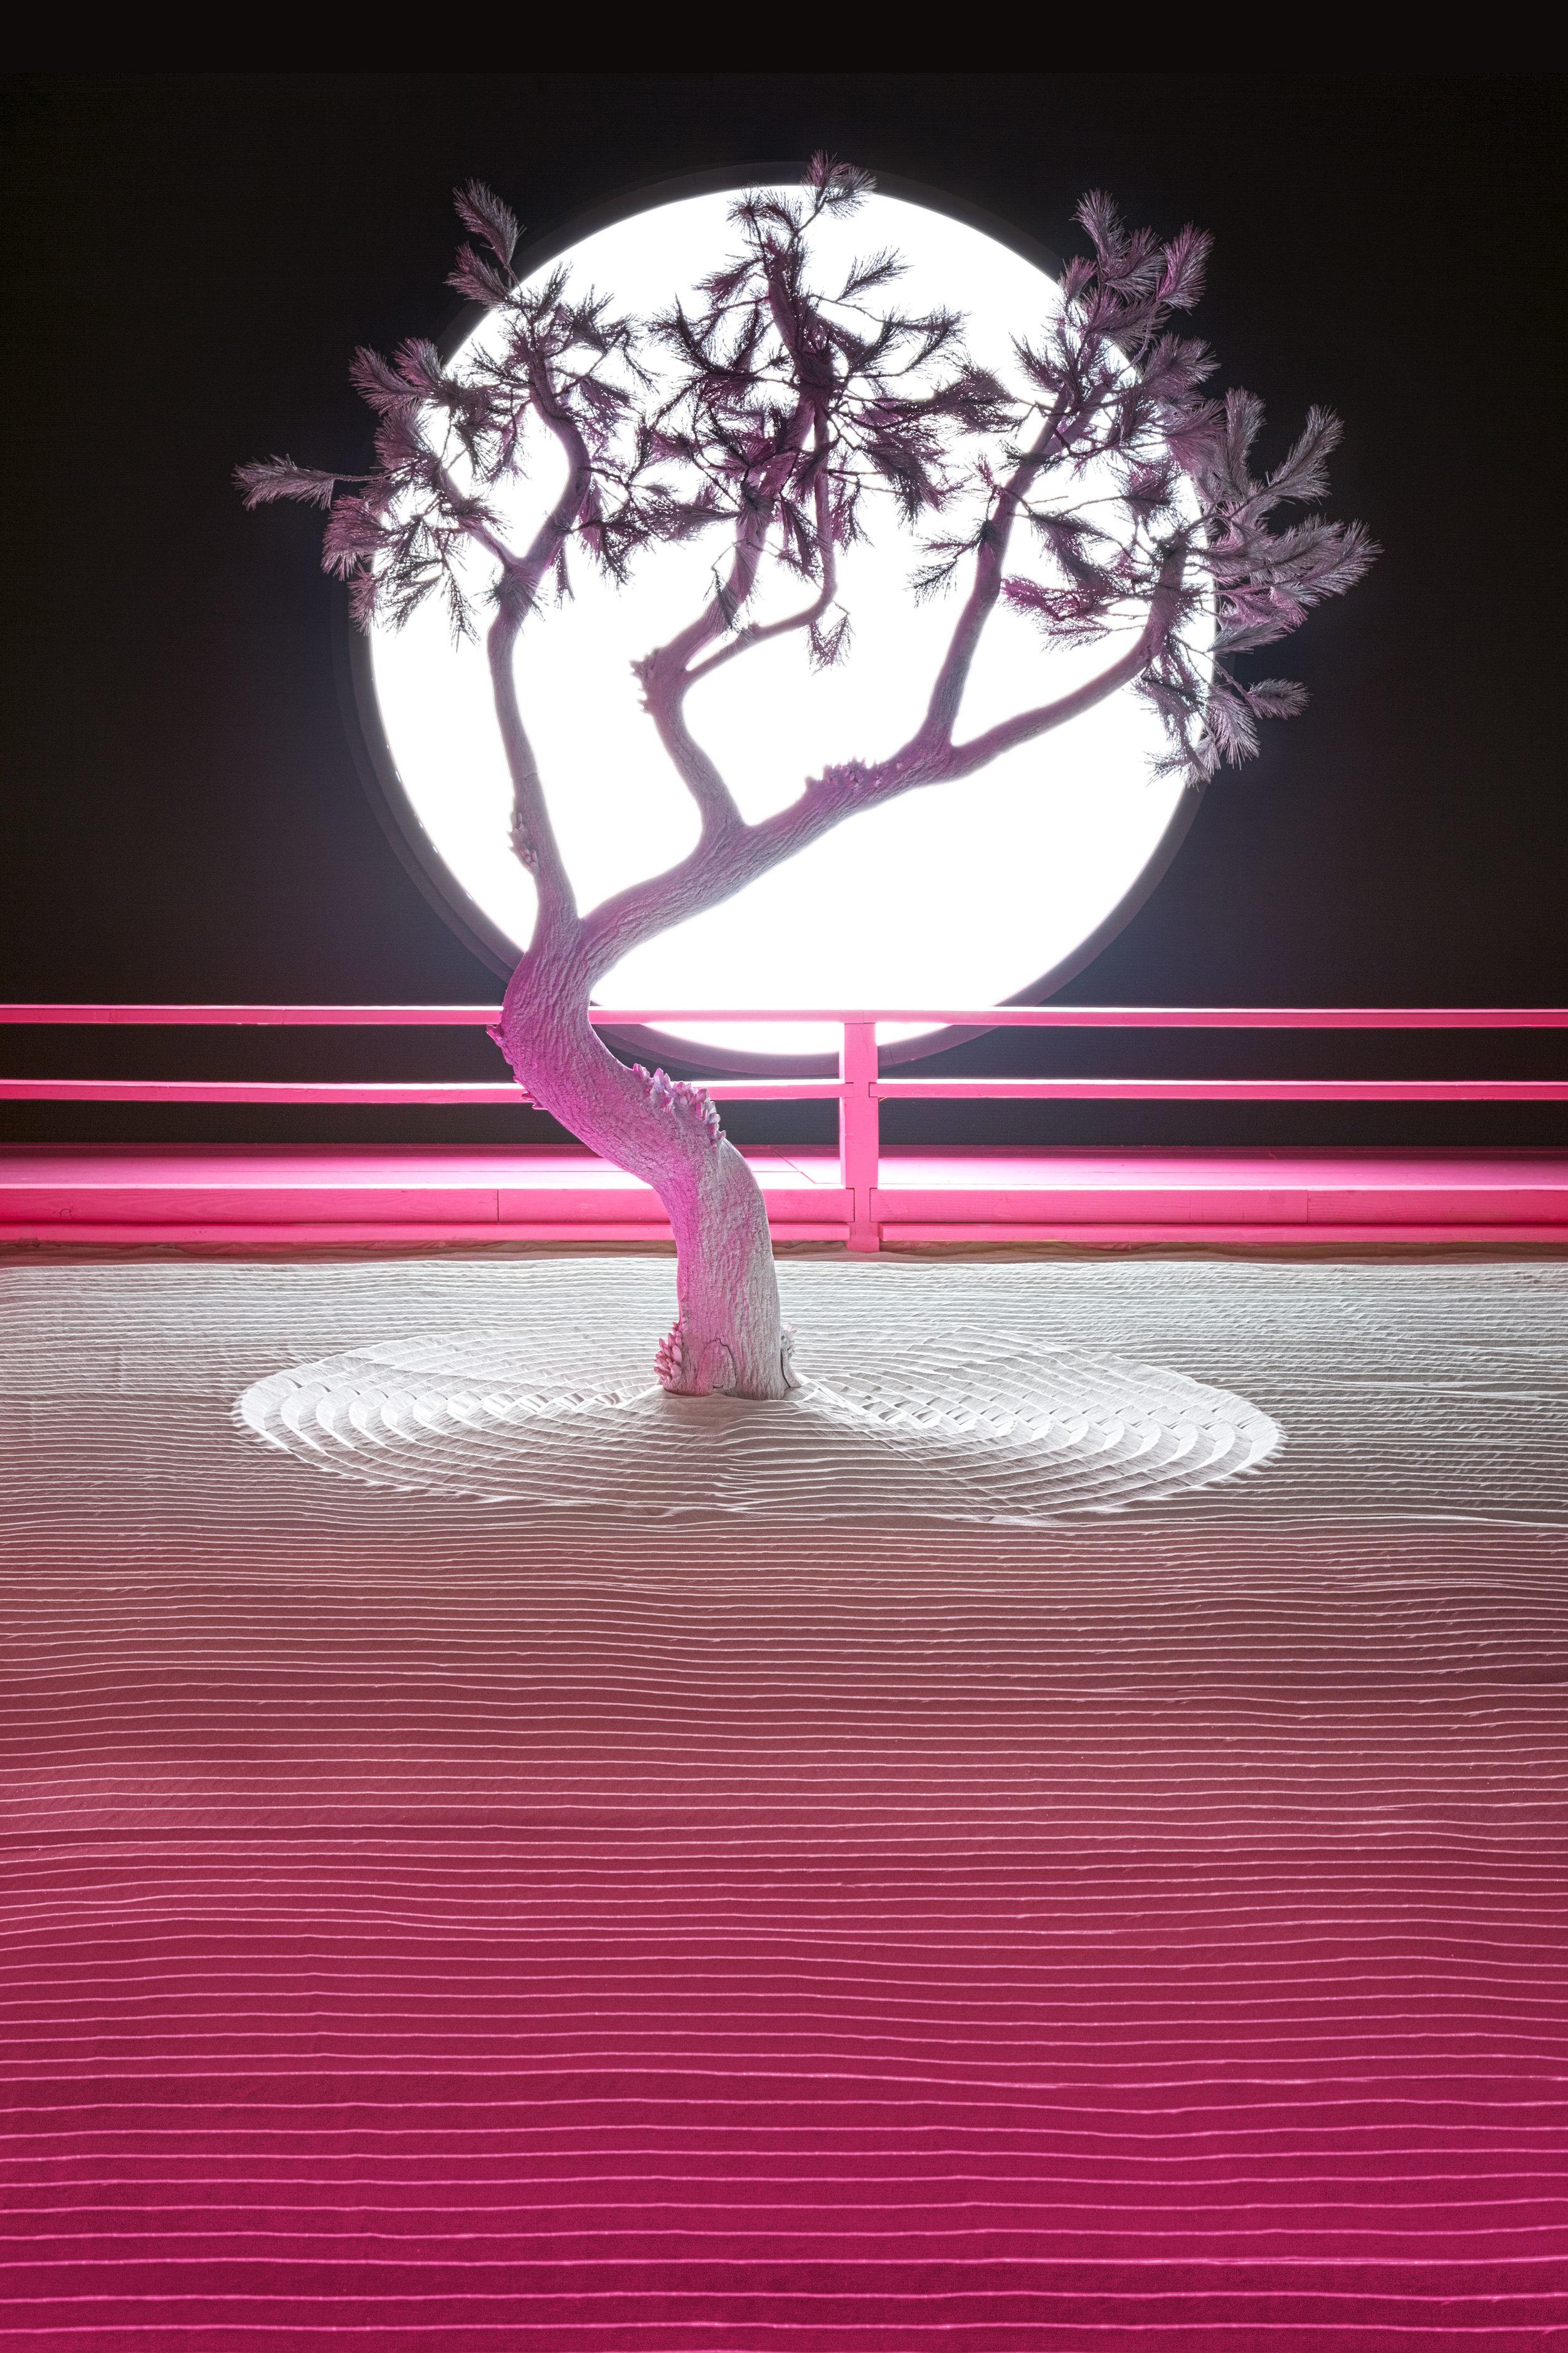 Visionaire_Daniel-Arsham_Lunar-Garden_1.jpg